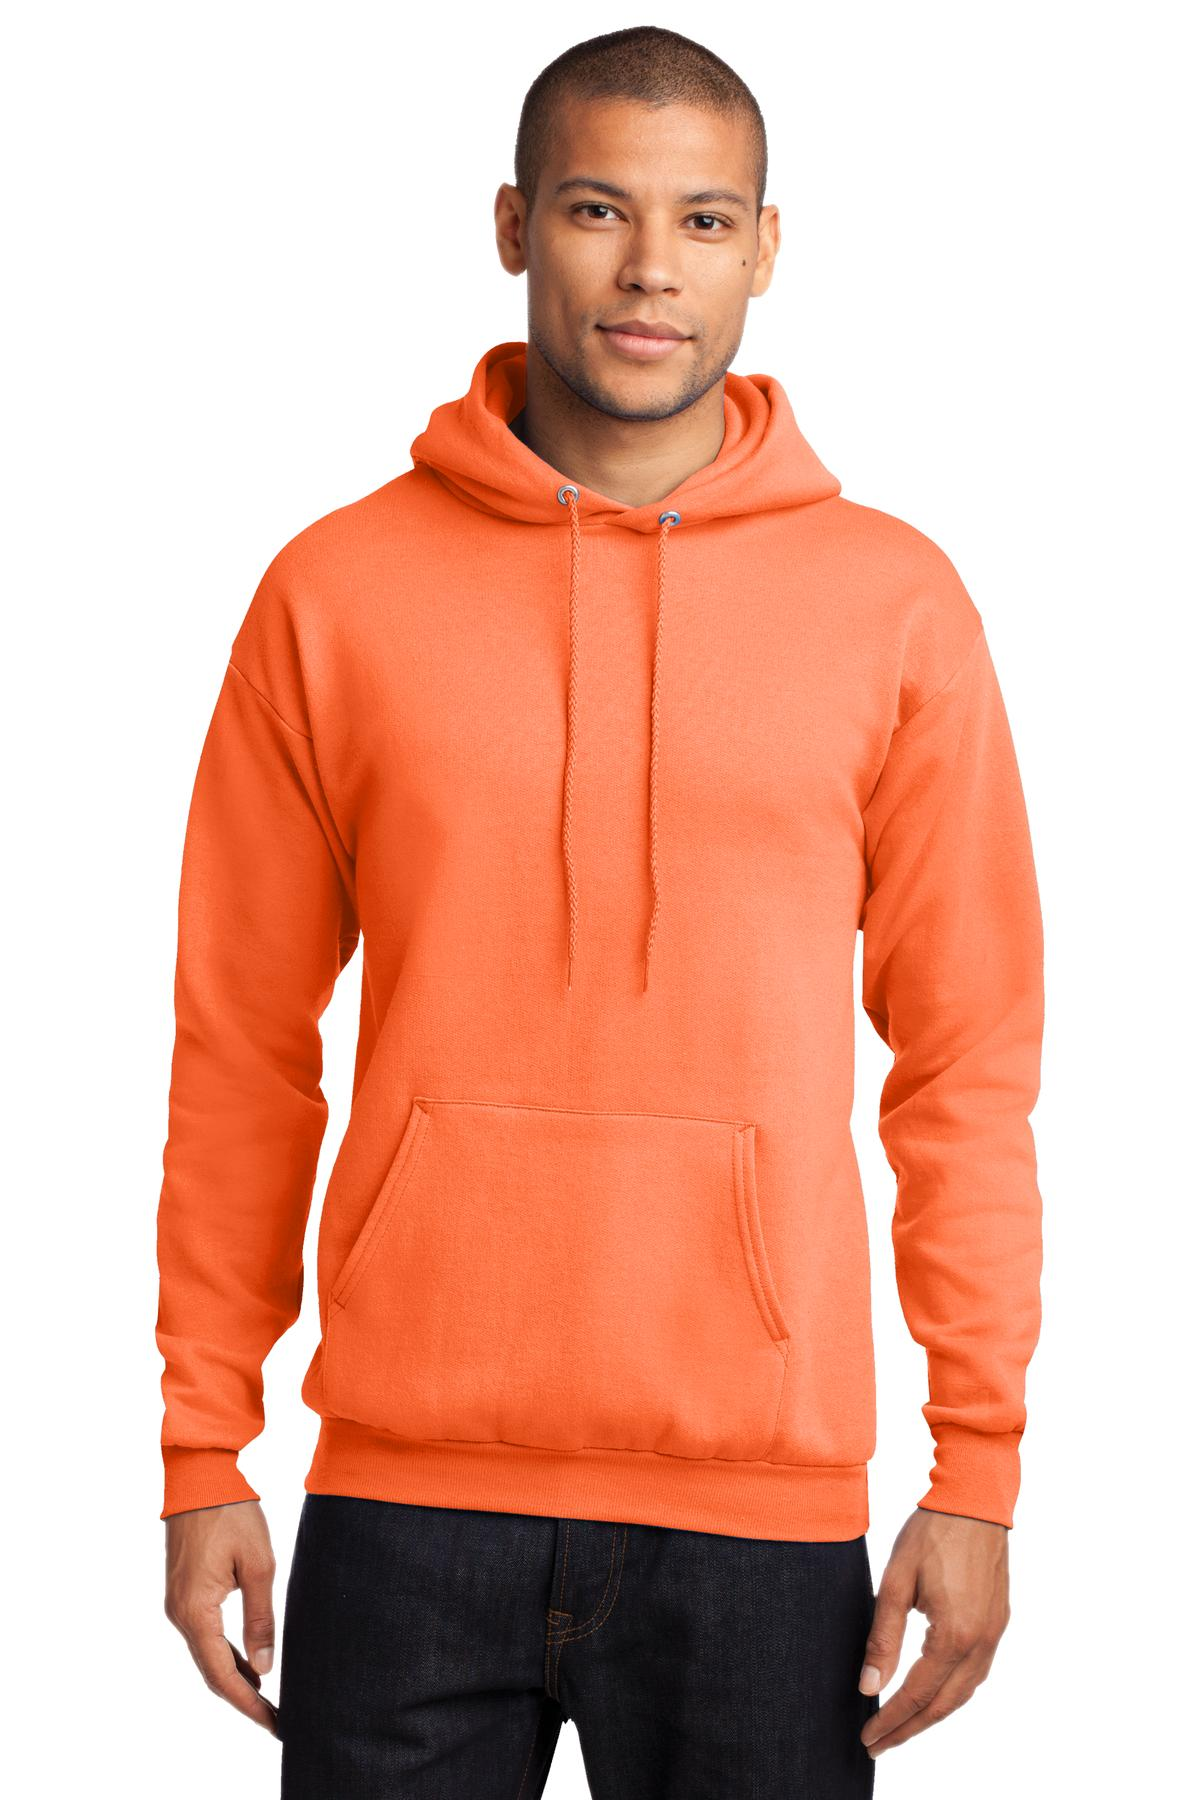 Port /& Company Mens Pullover Pocket Hooded Sweatshirt Orange Small